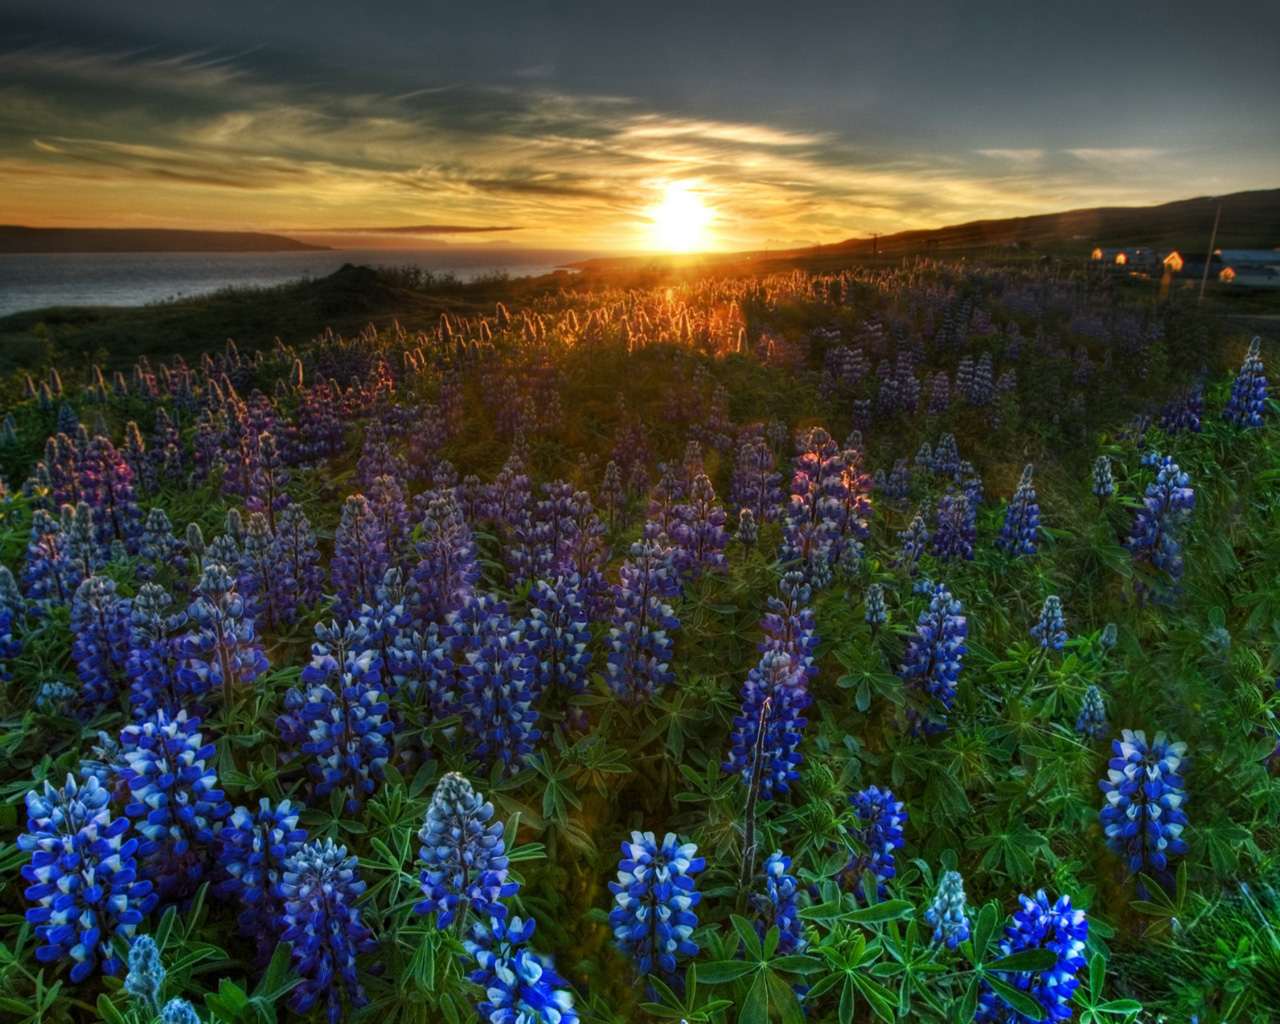 Lavender Fields Wallpapers Lavender Fields Myspace Backgrounds 1280x1024